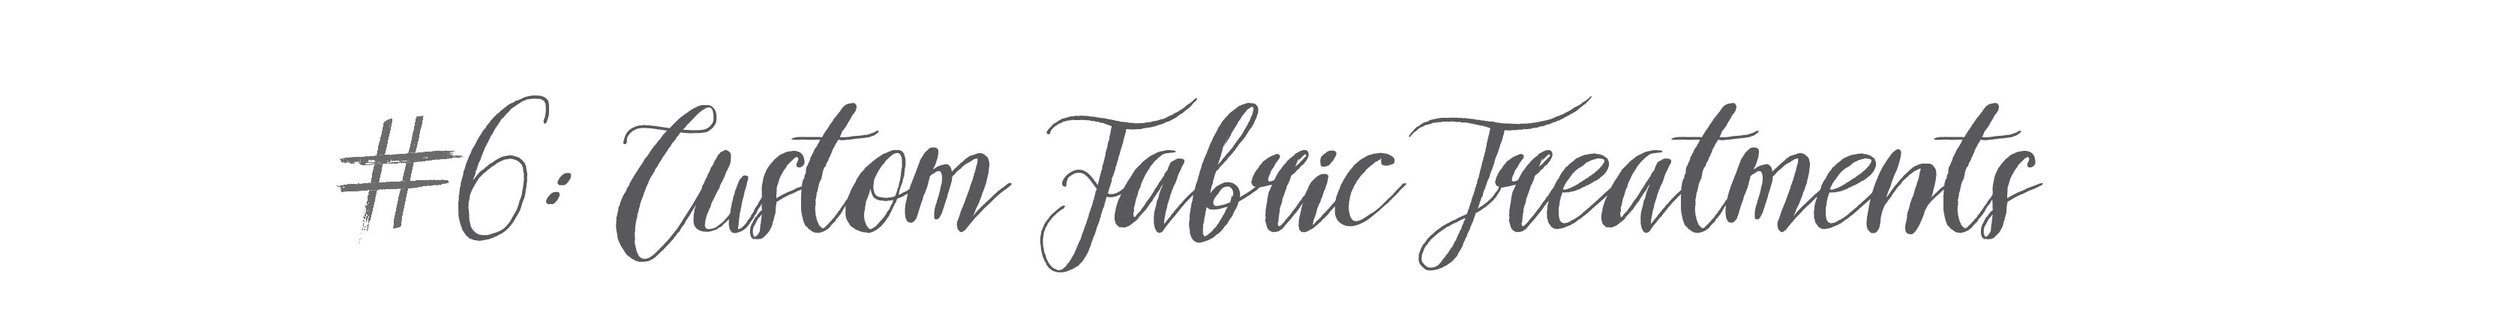 #6: Custom Fabric Treatments